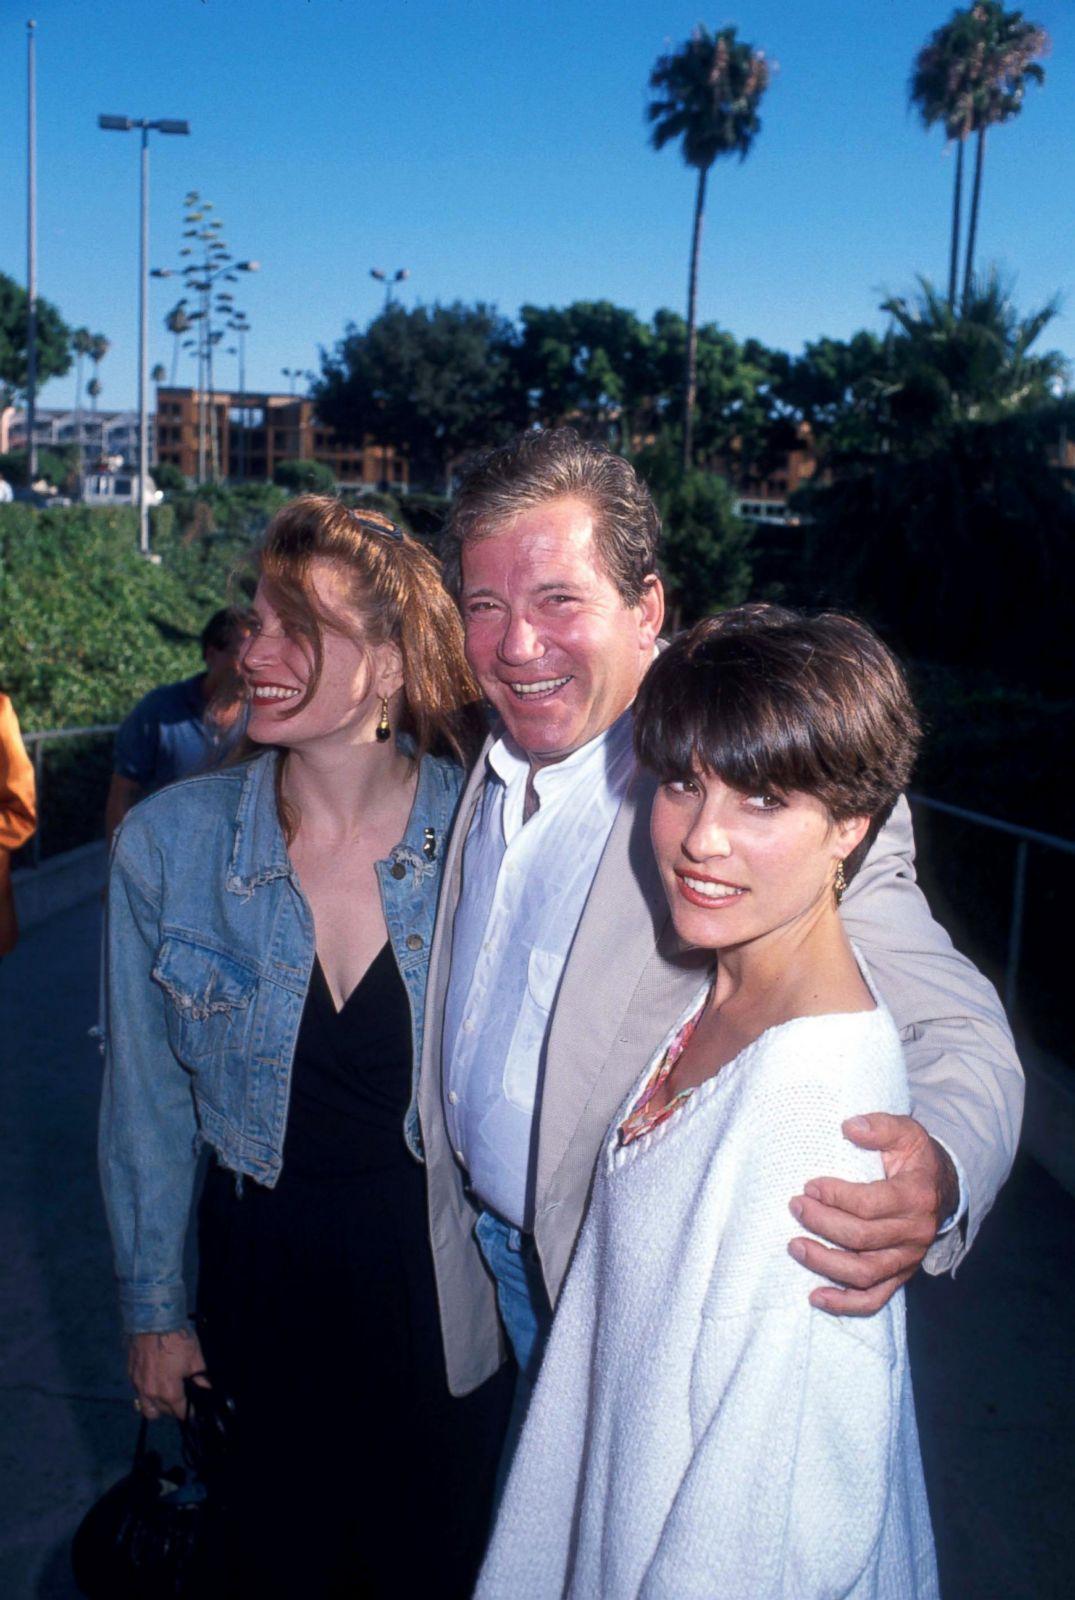 William Shatner through the years Photos | Image #91 - ABC News